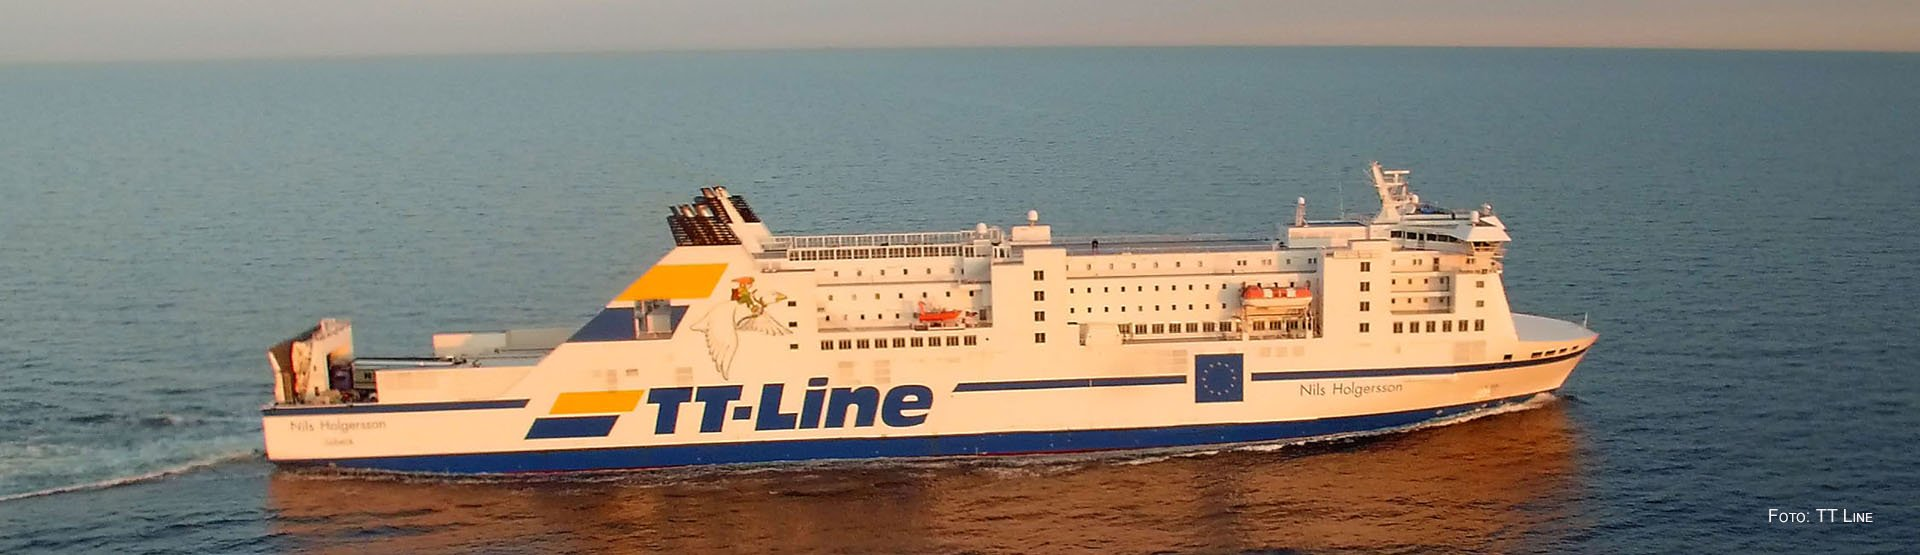 Tt Line Jobs